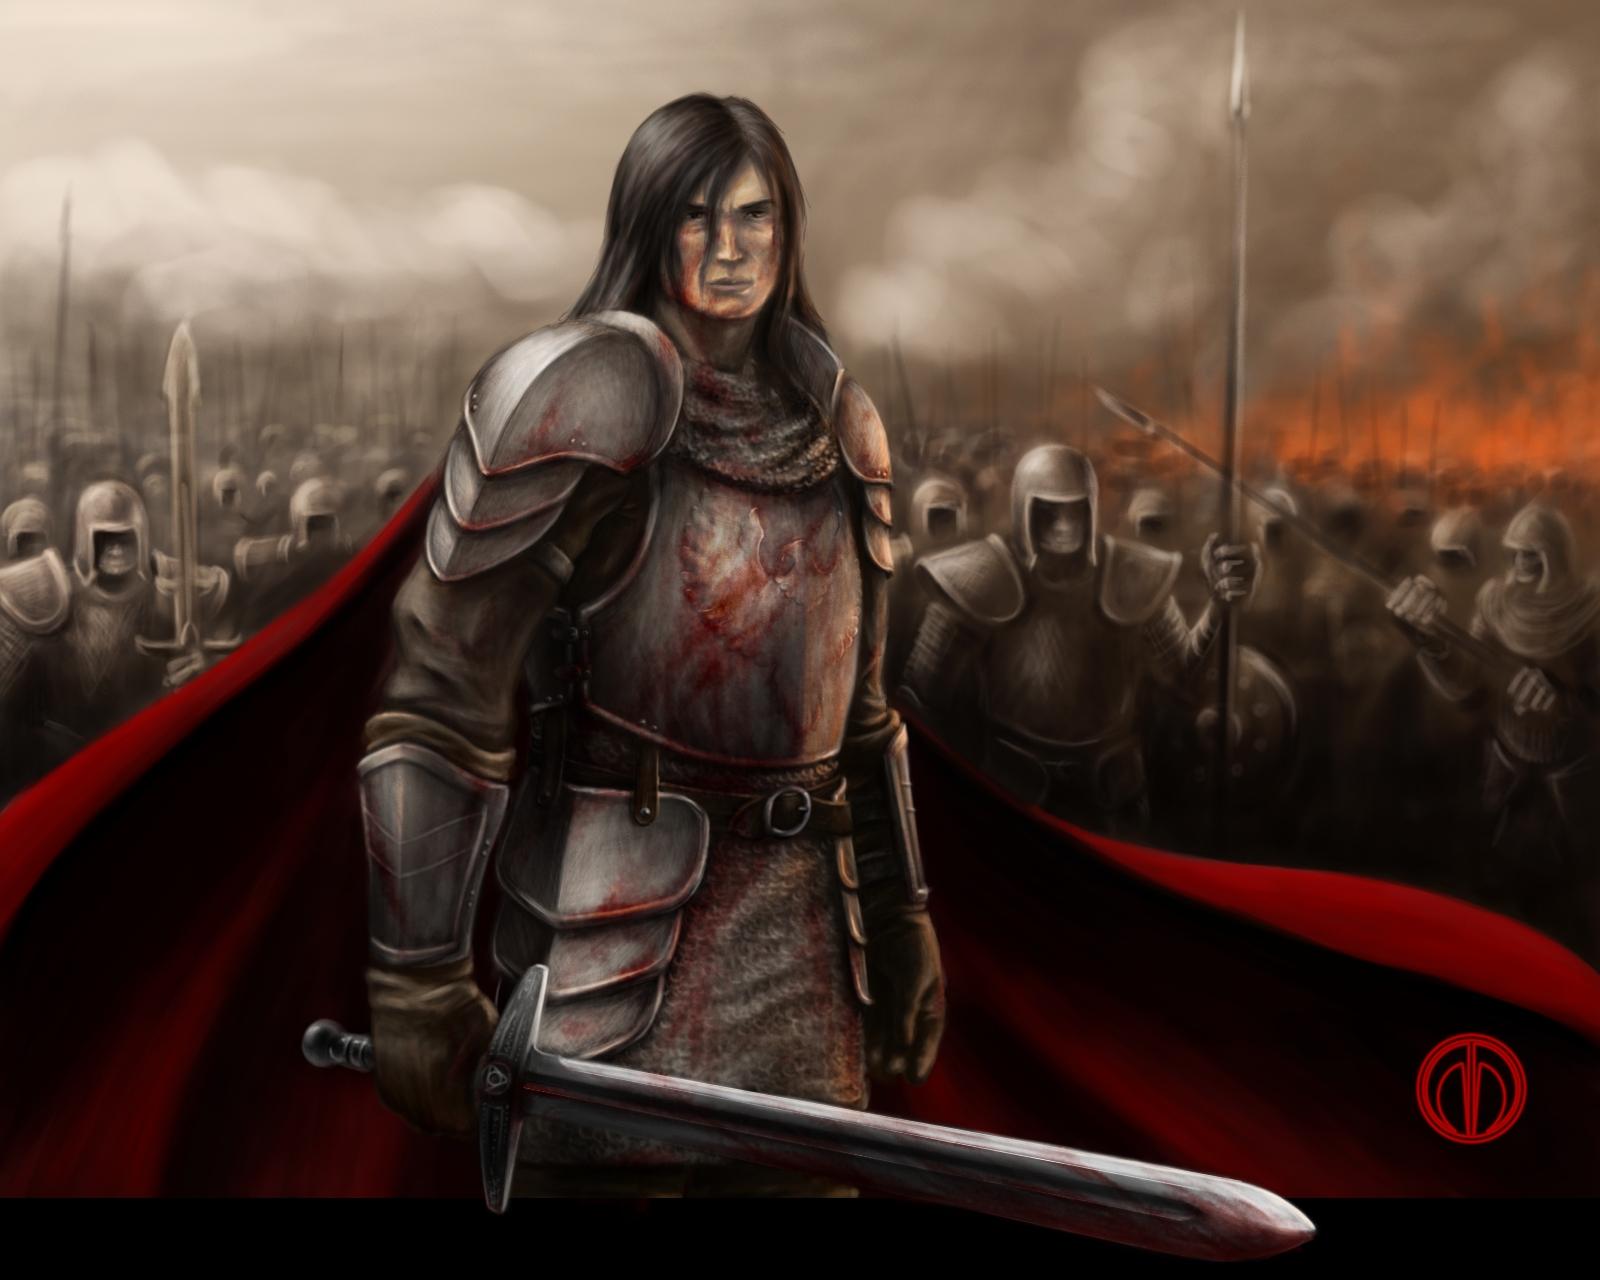 https://orig03.deviantart.net/7734/f/2014/003/4/e/berserk___imperial_knight_by_warl88-d2p4wig.jpg